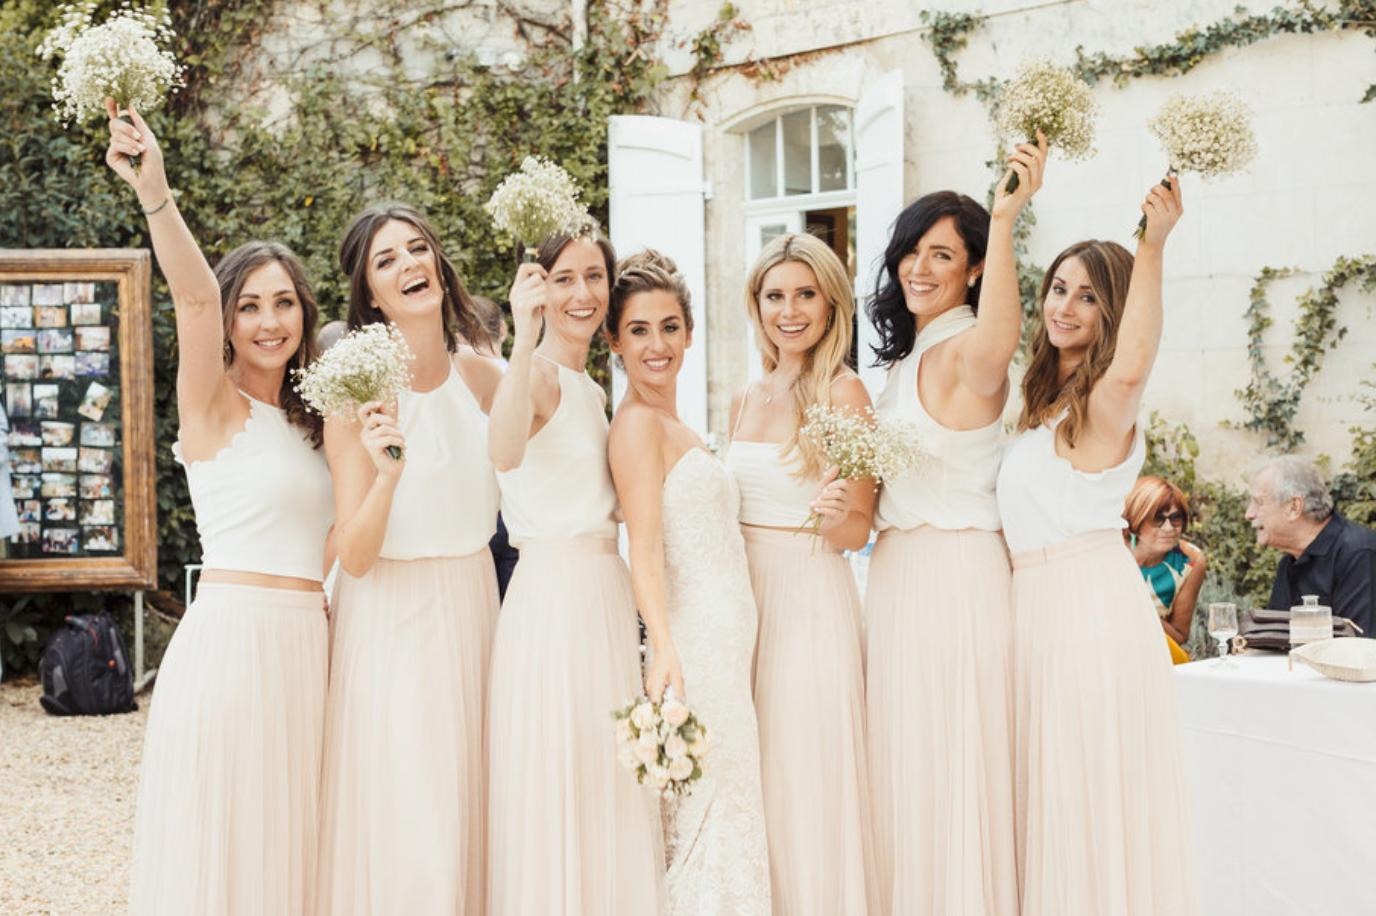 Mariage_Gascogne_wedding_planner_LB15.pn